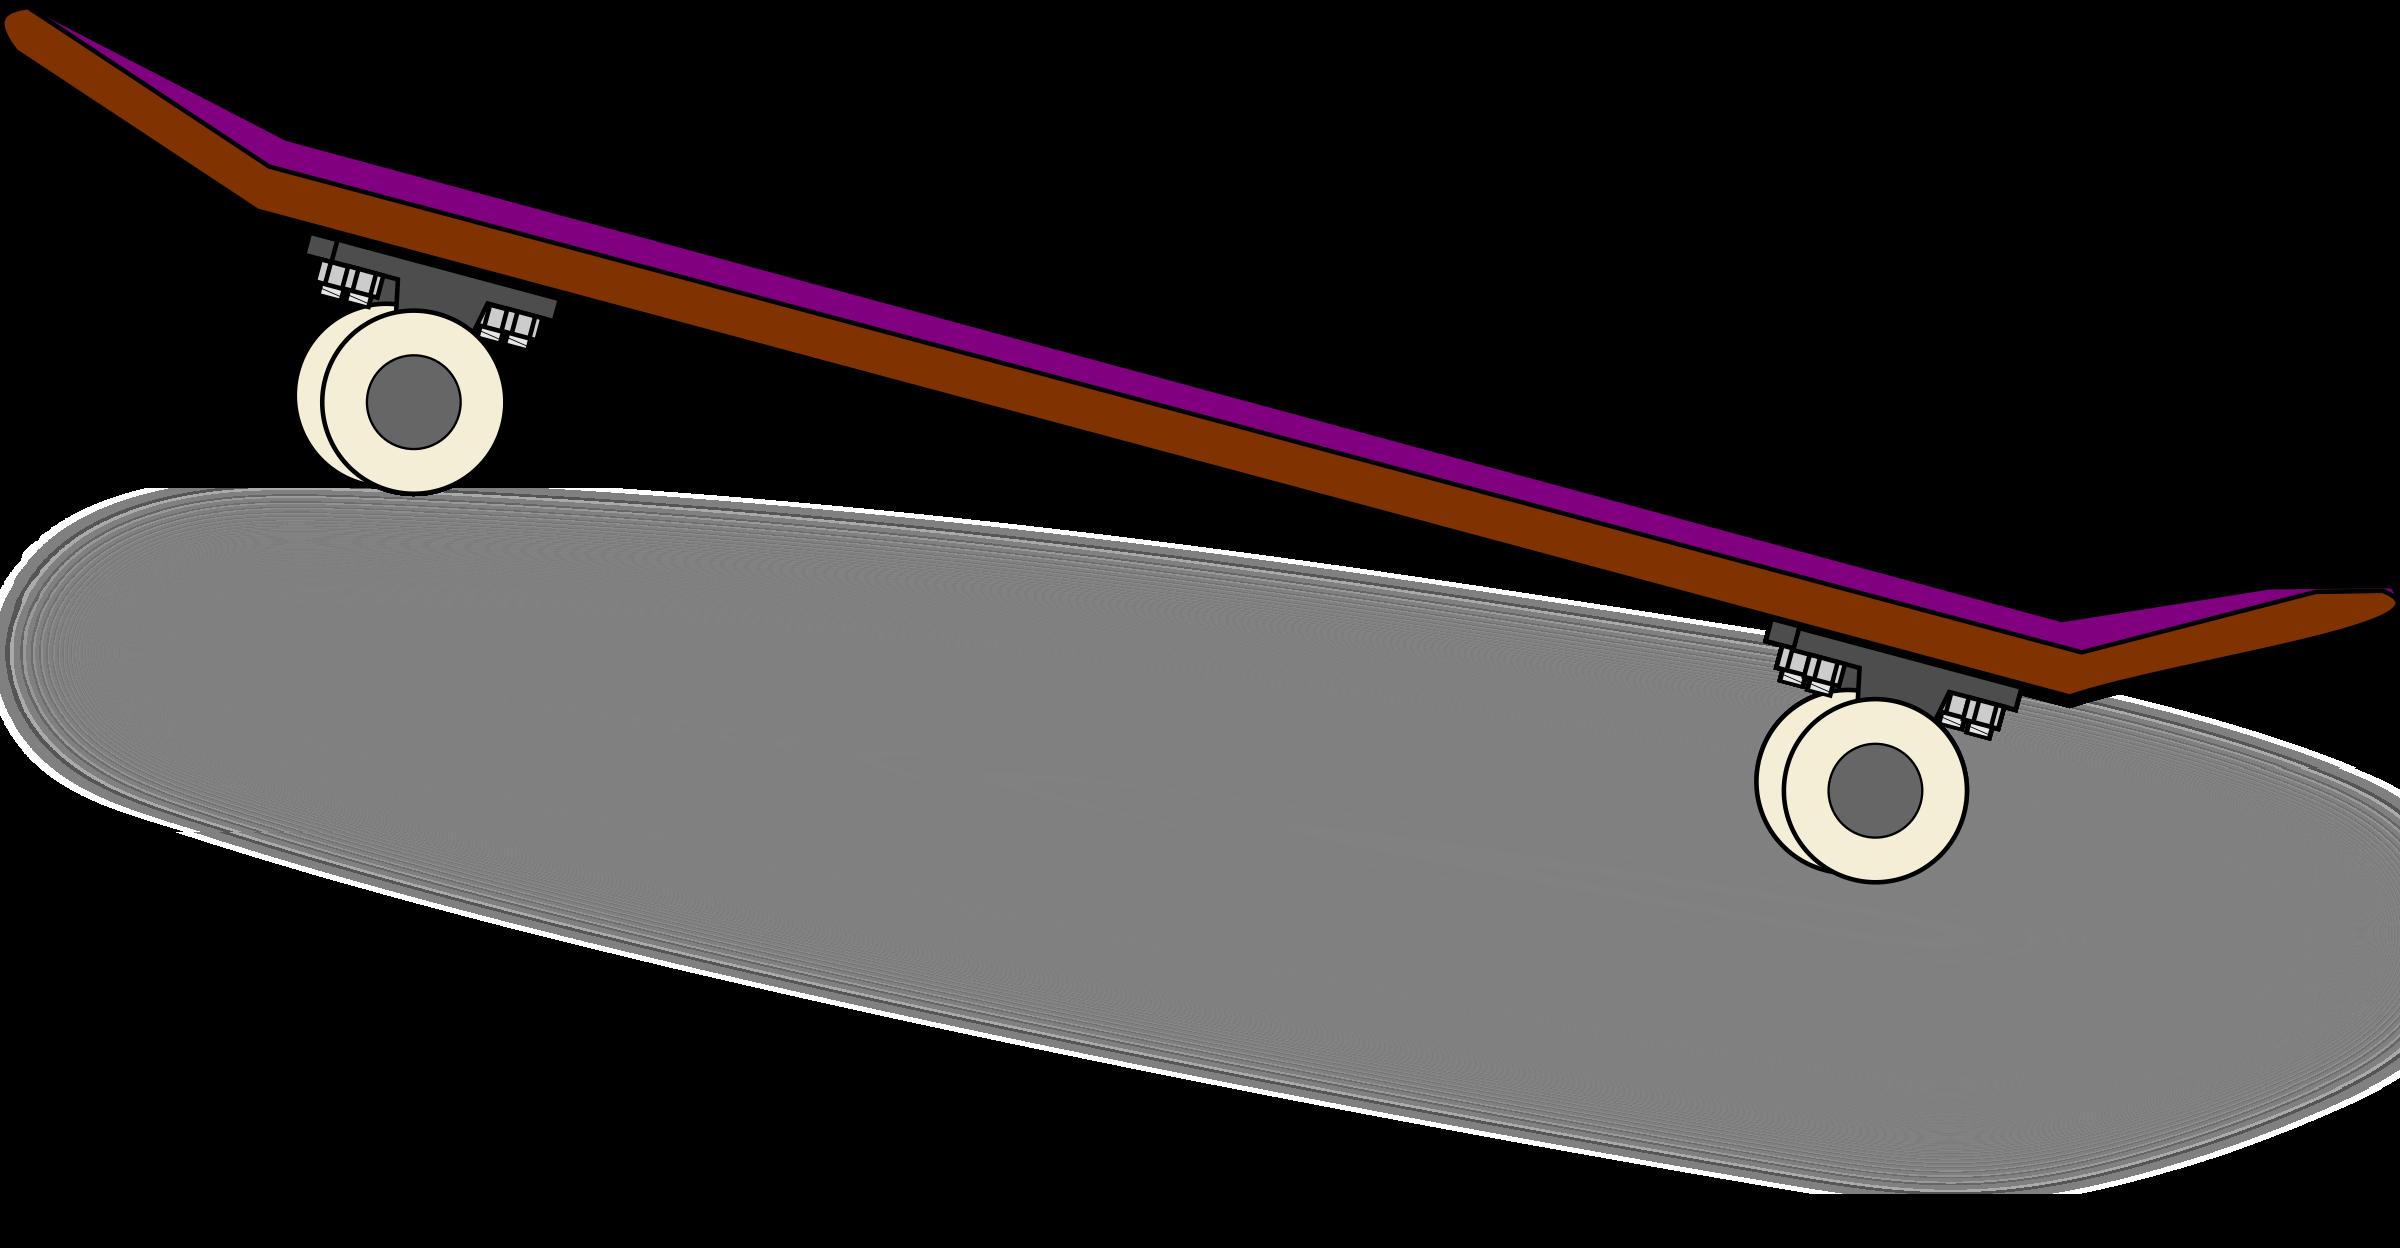 Skateboard vector clipart free public domain stock photo